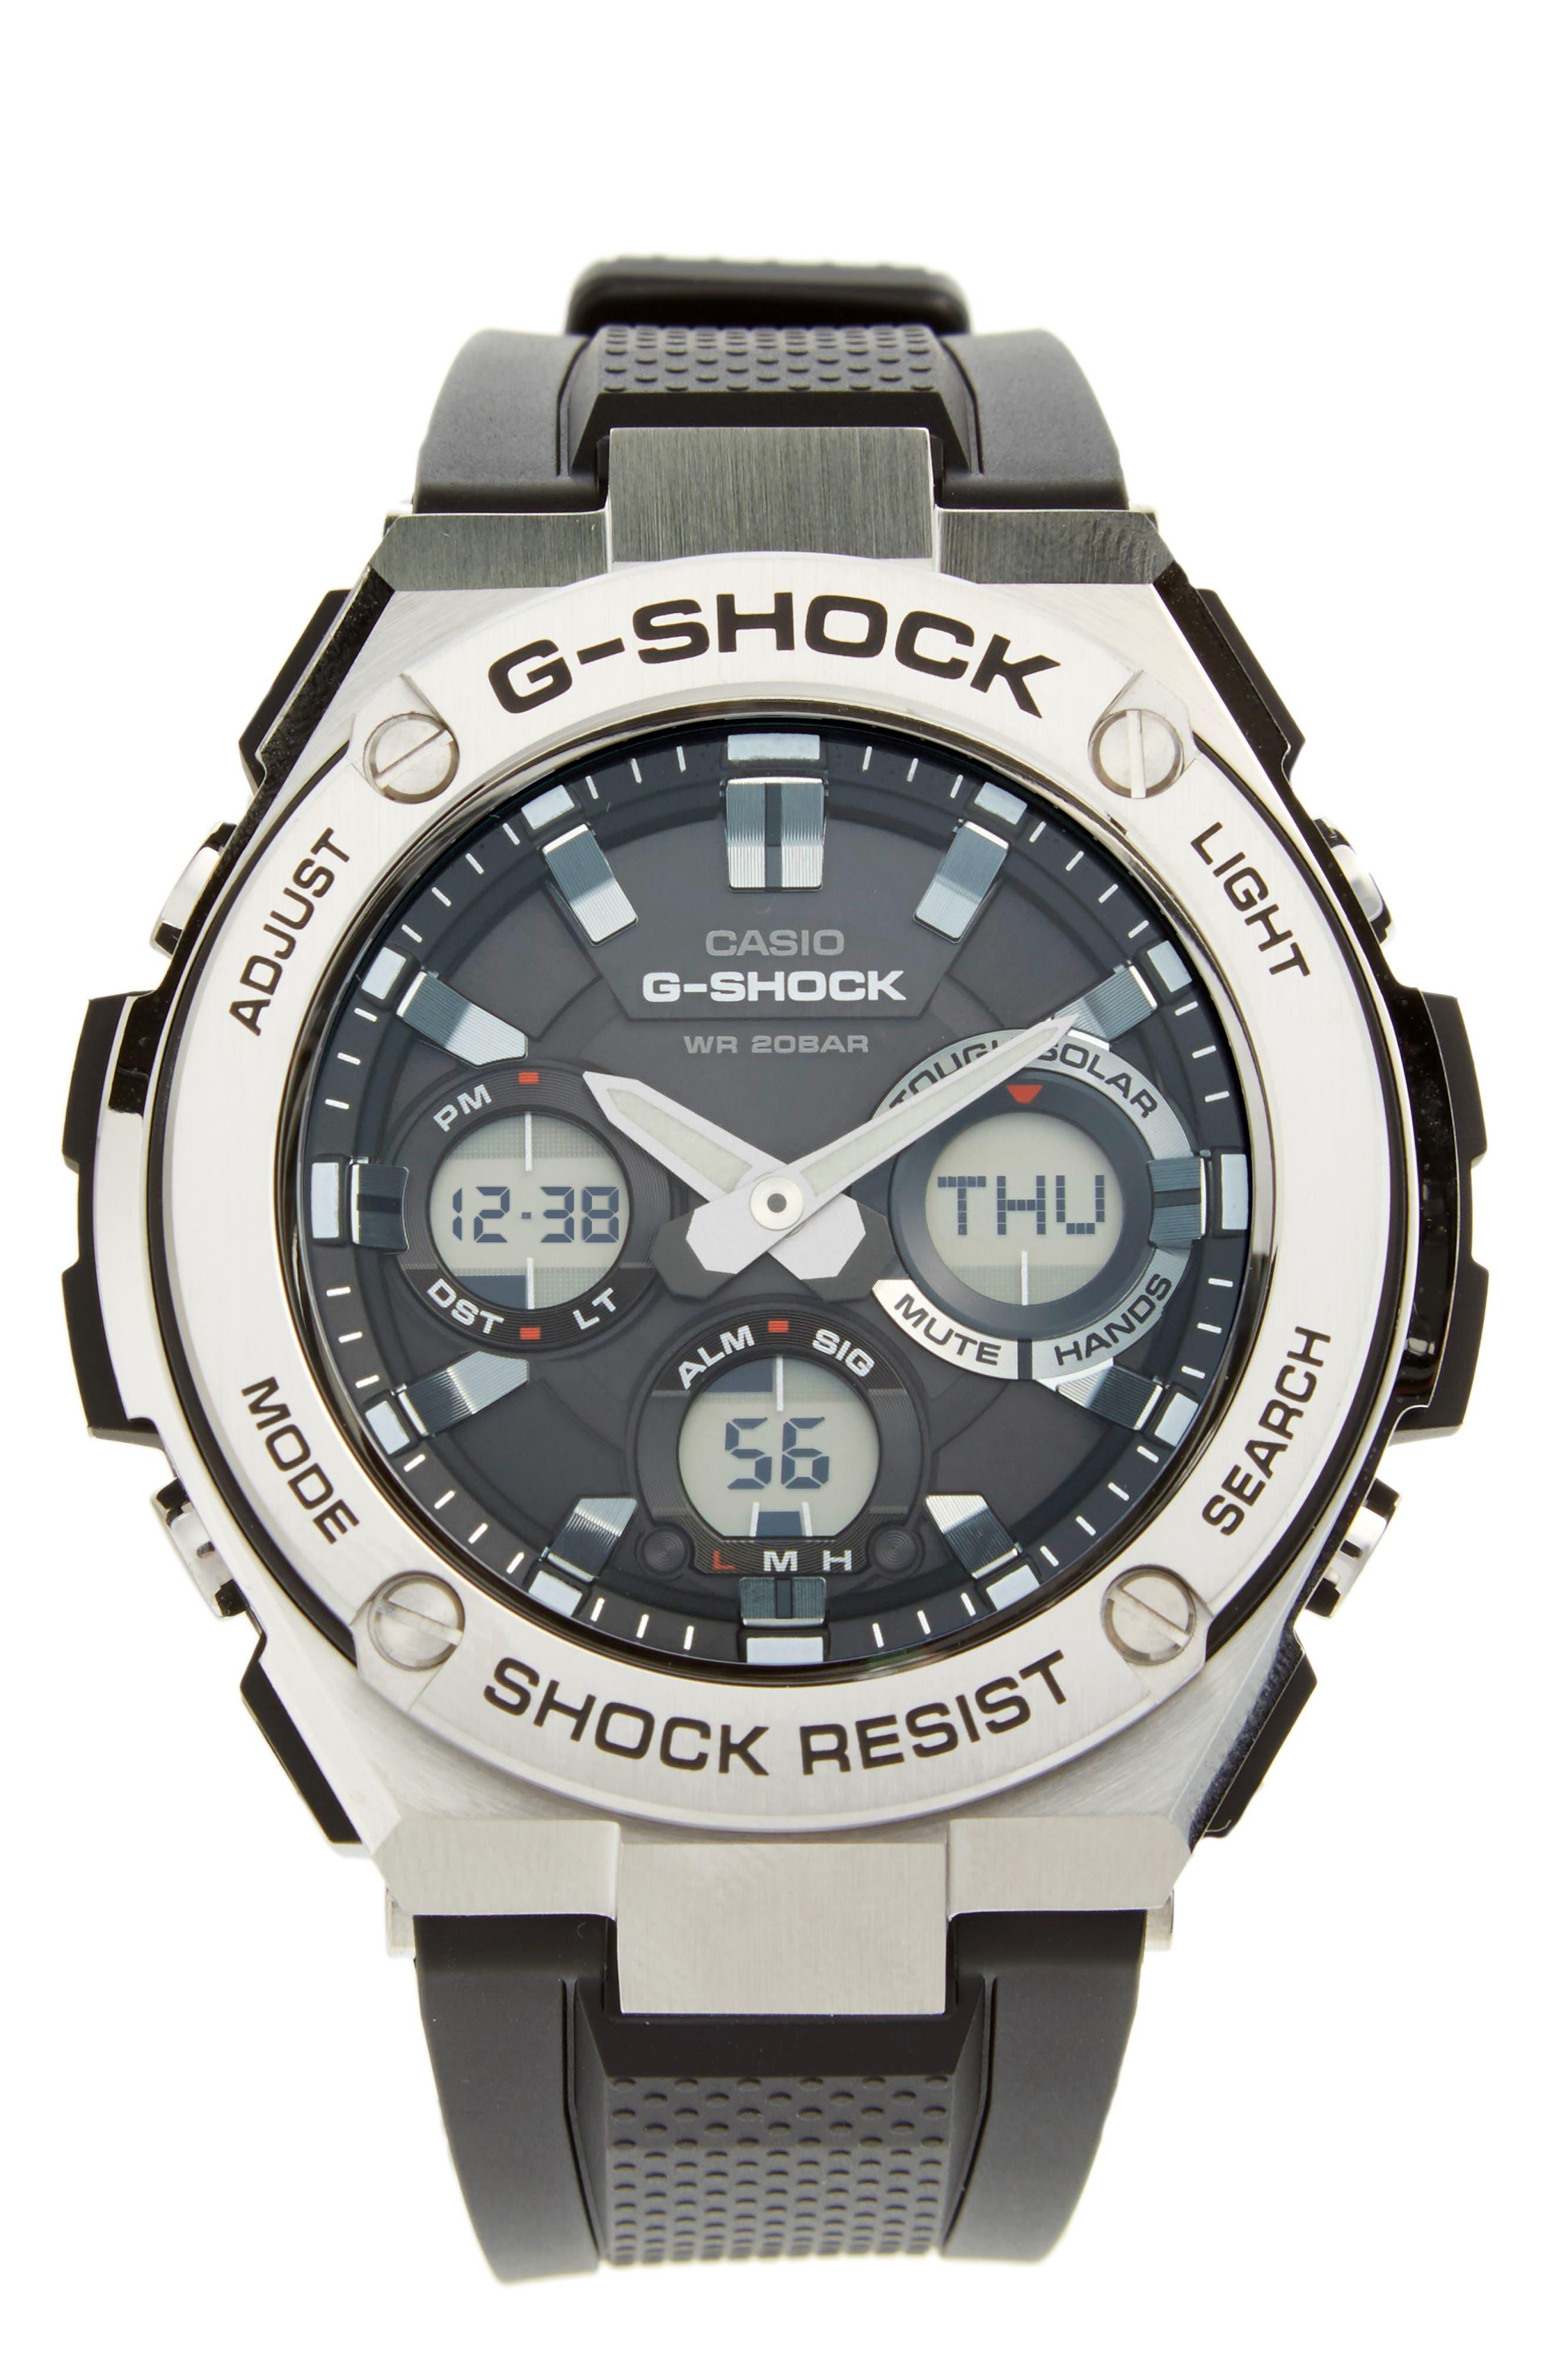 G-SHOCK BABY-G G-Shock 'G-Steel' Ana-Digi Resin Strap Watch, 59mm x 52mm, Main, color, BLACK